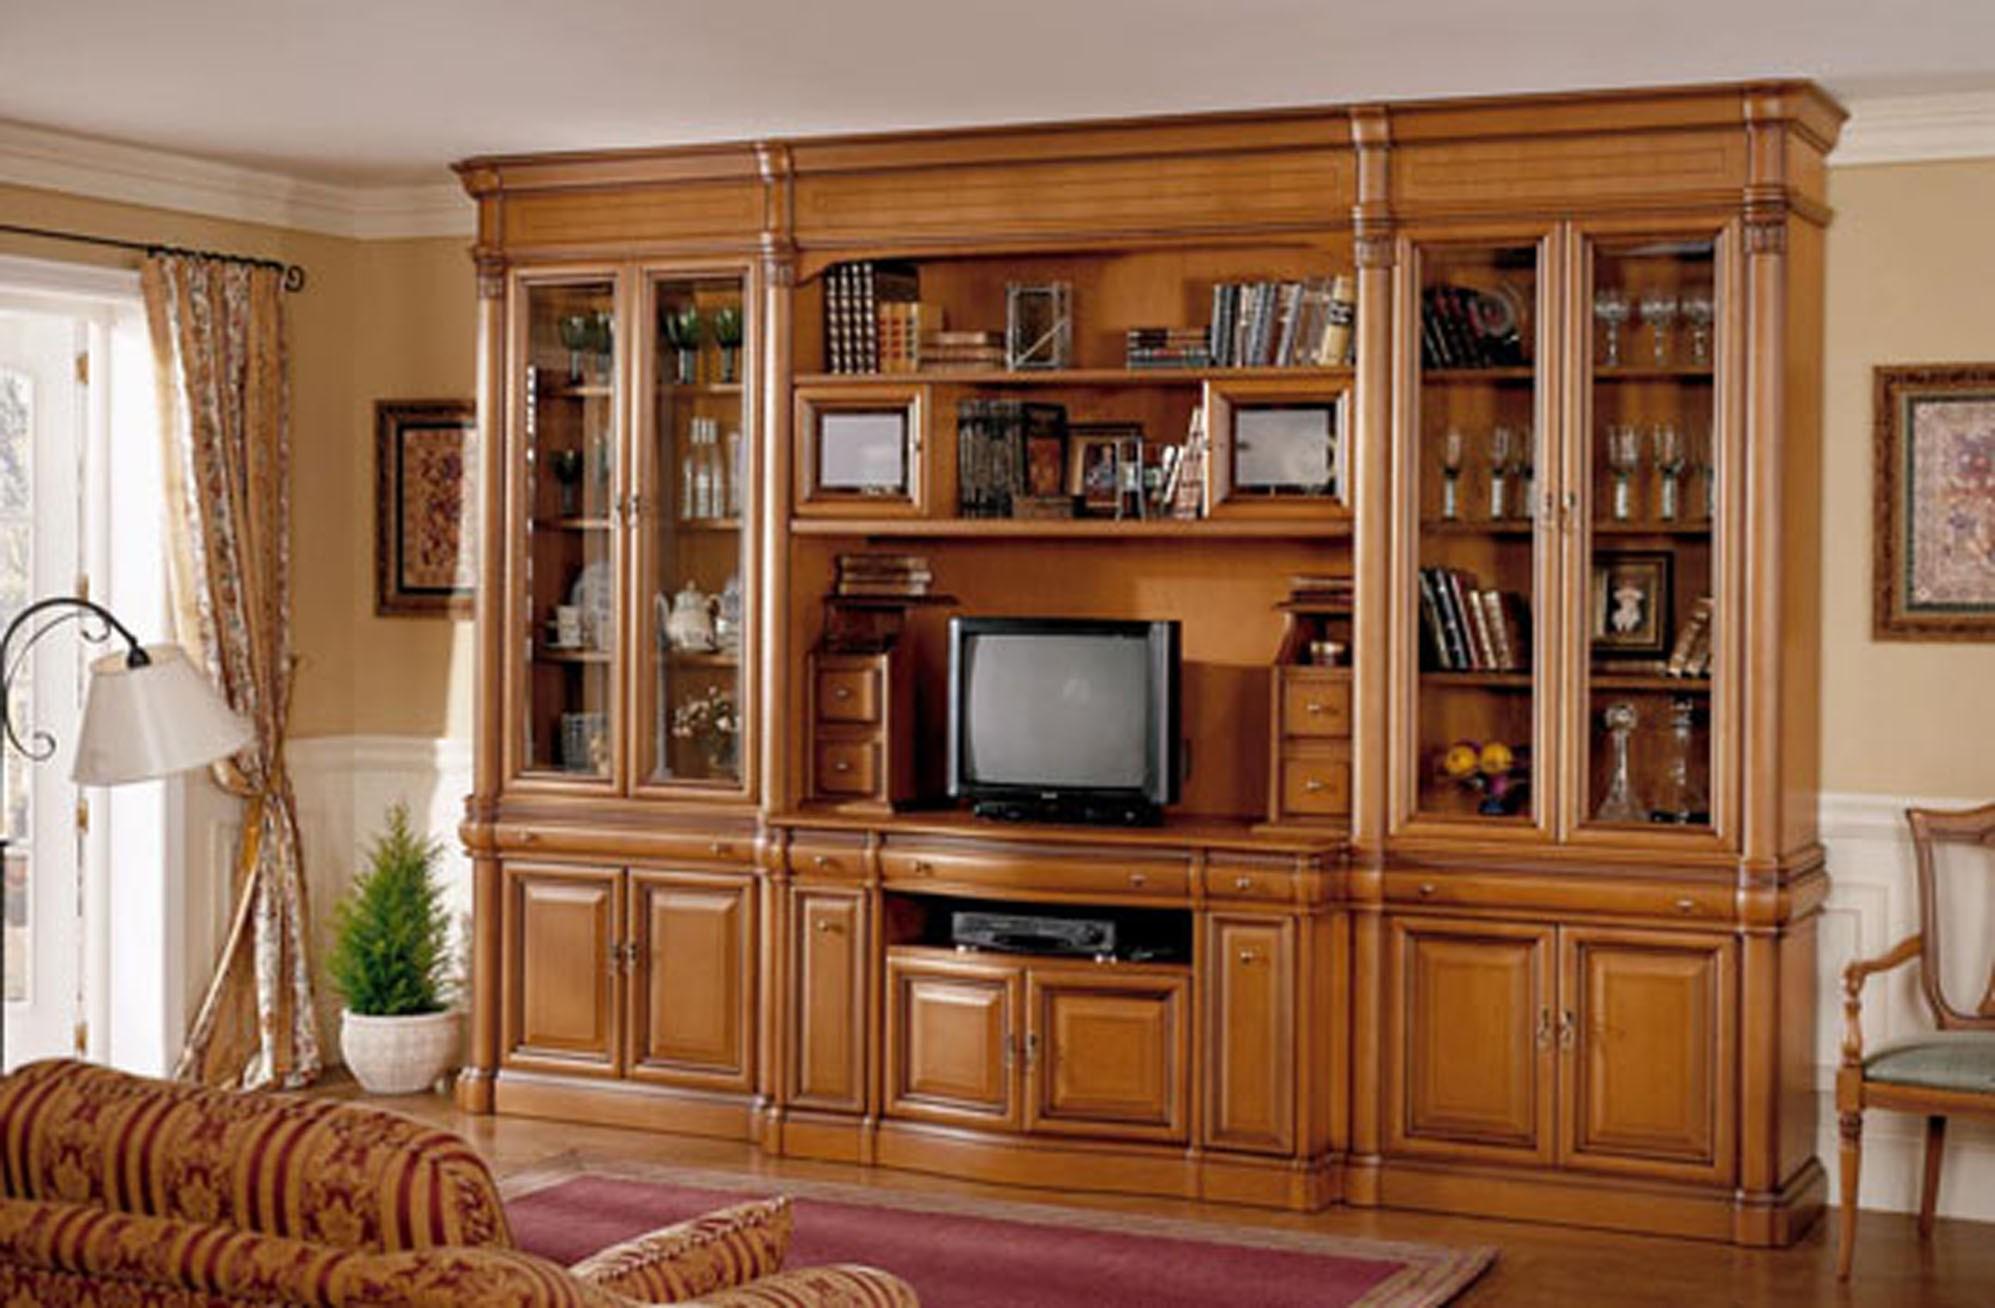 Mueble comedor clasico boisserie muebles valencia for Catalogo de muebles de salon clasicos